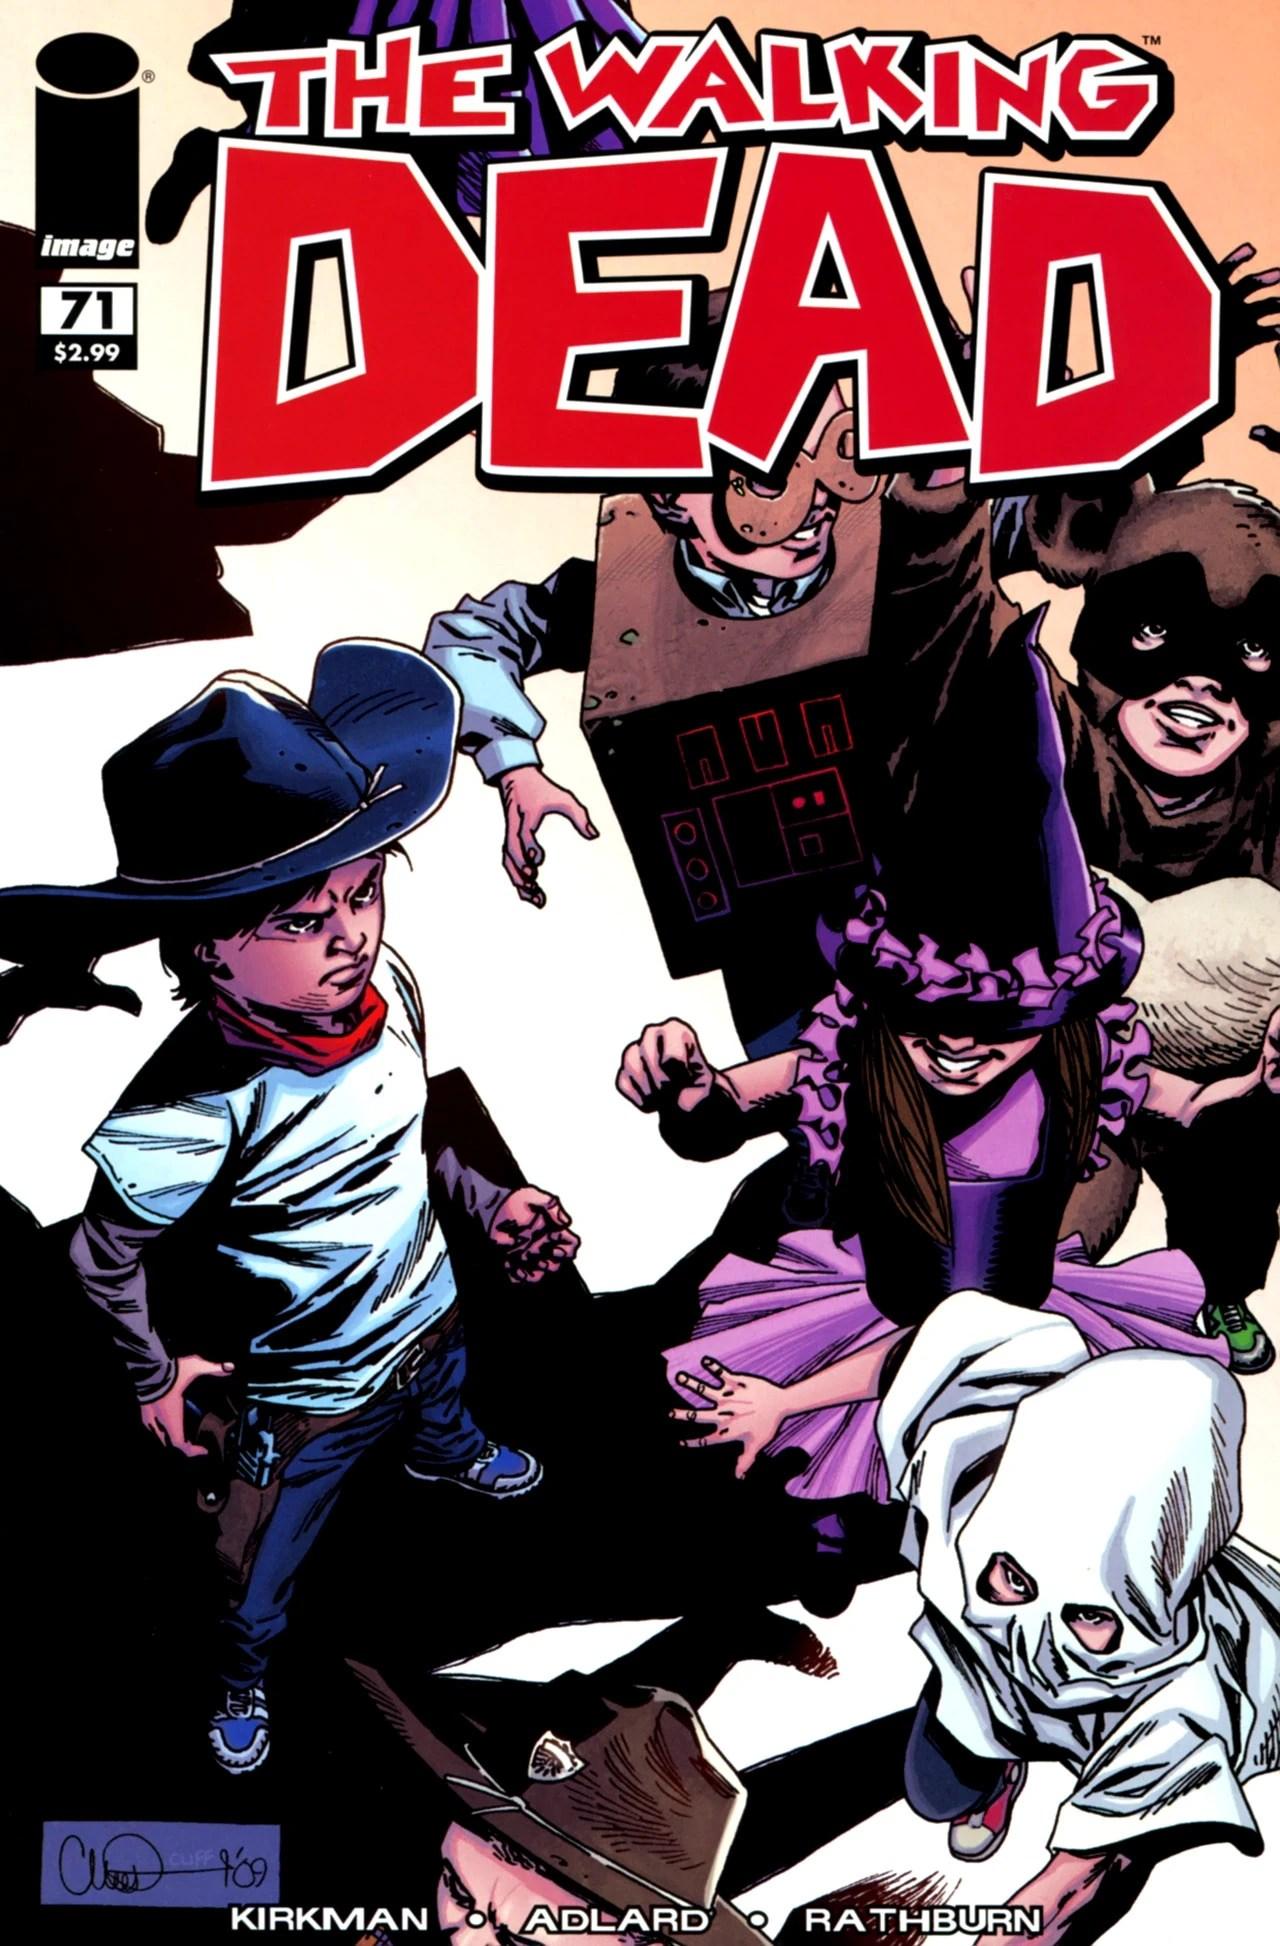 The Walking Dead Vol 1 71  Image Comics Database  FANDOM powered by Wikia